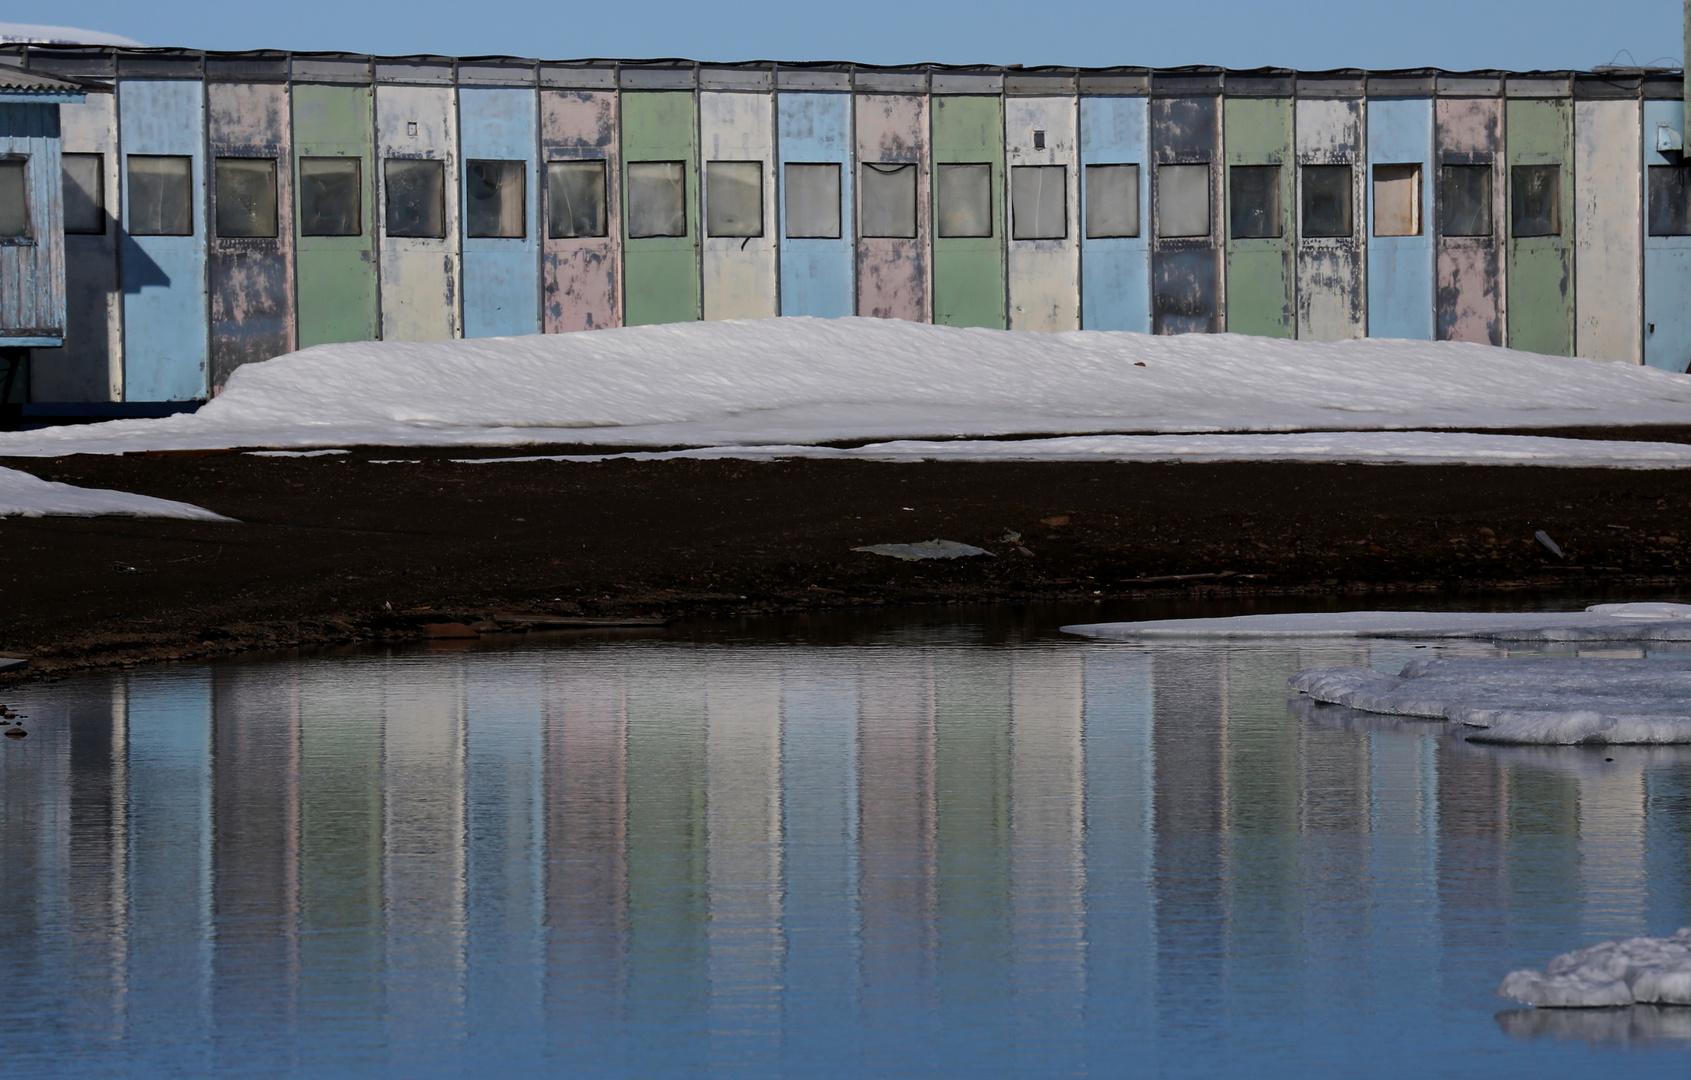 verlassene Unterkünfte in der Arktis